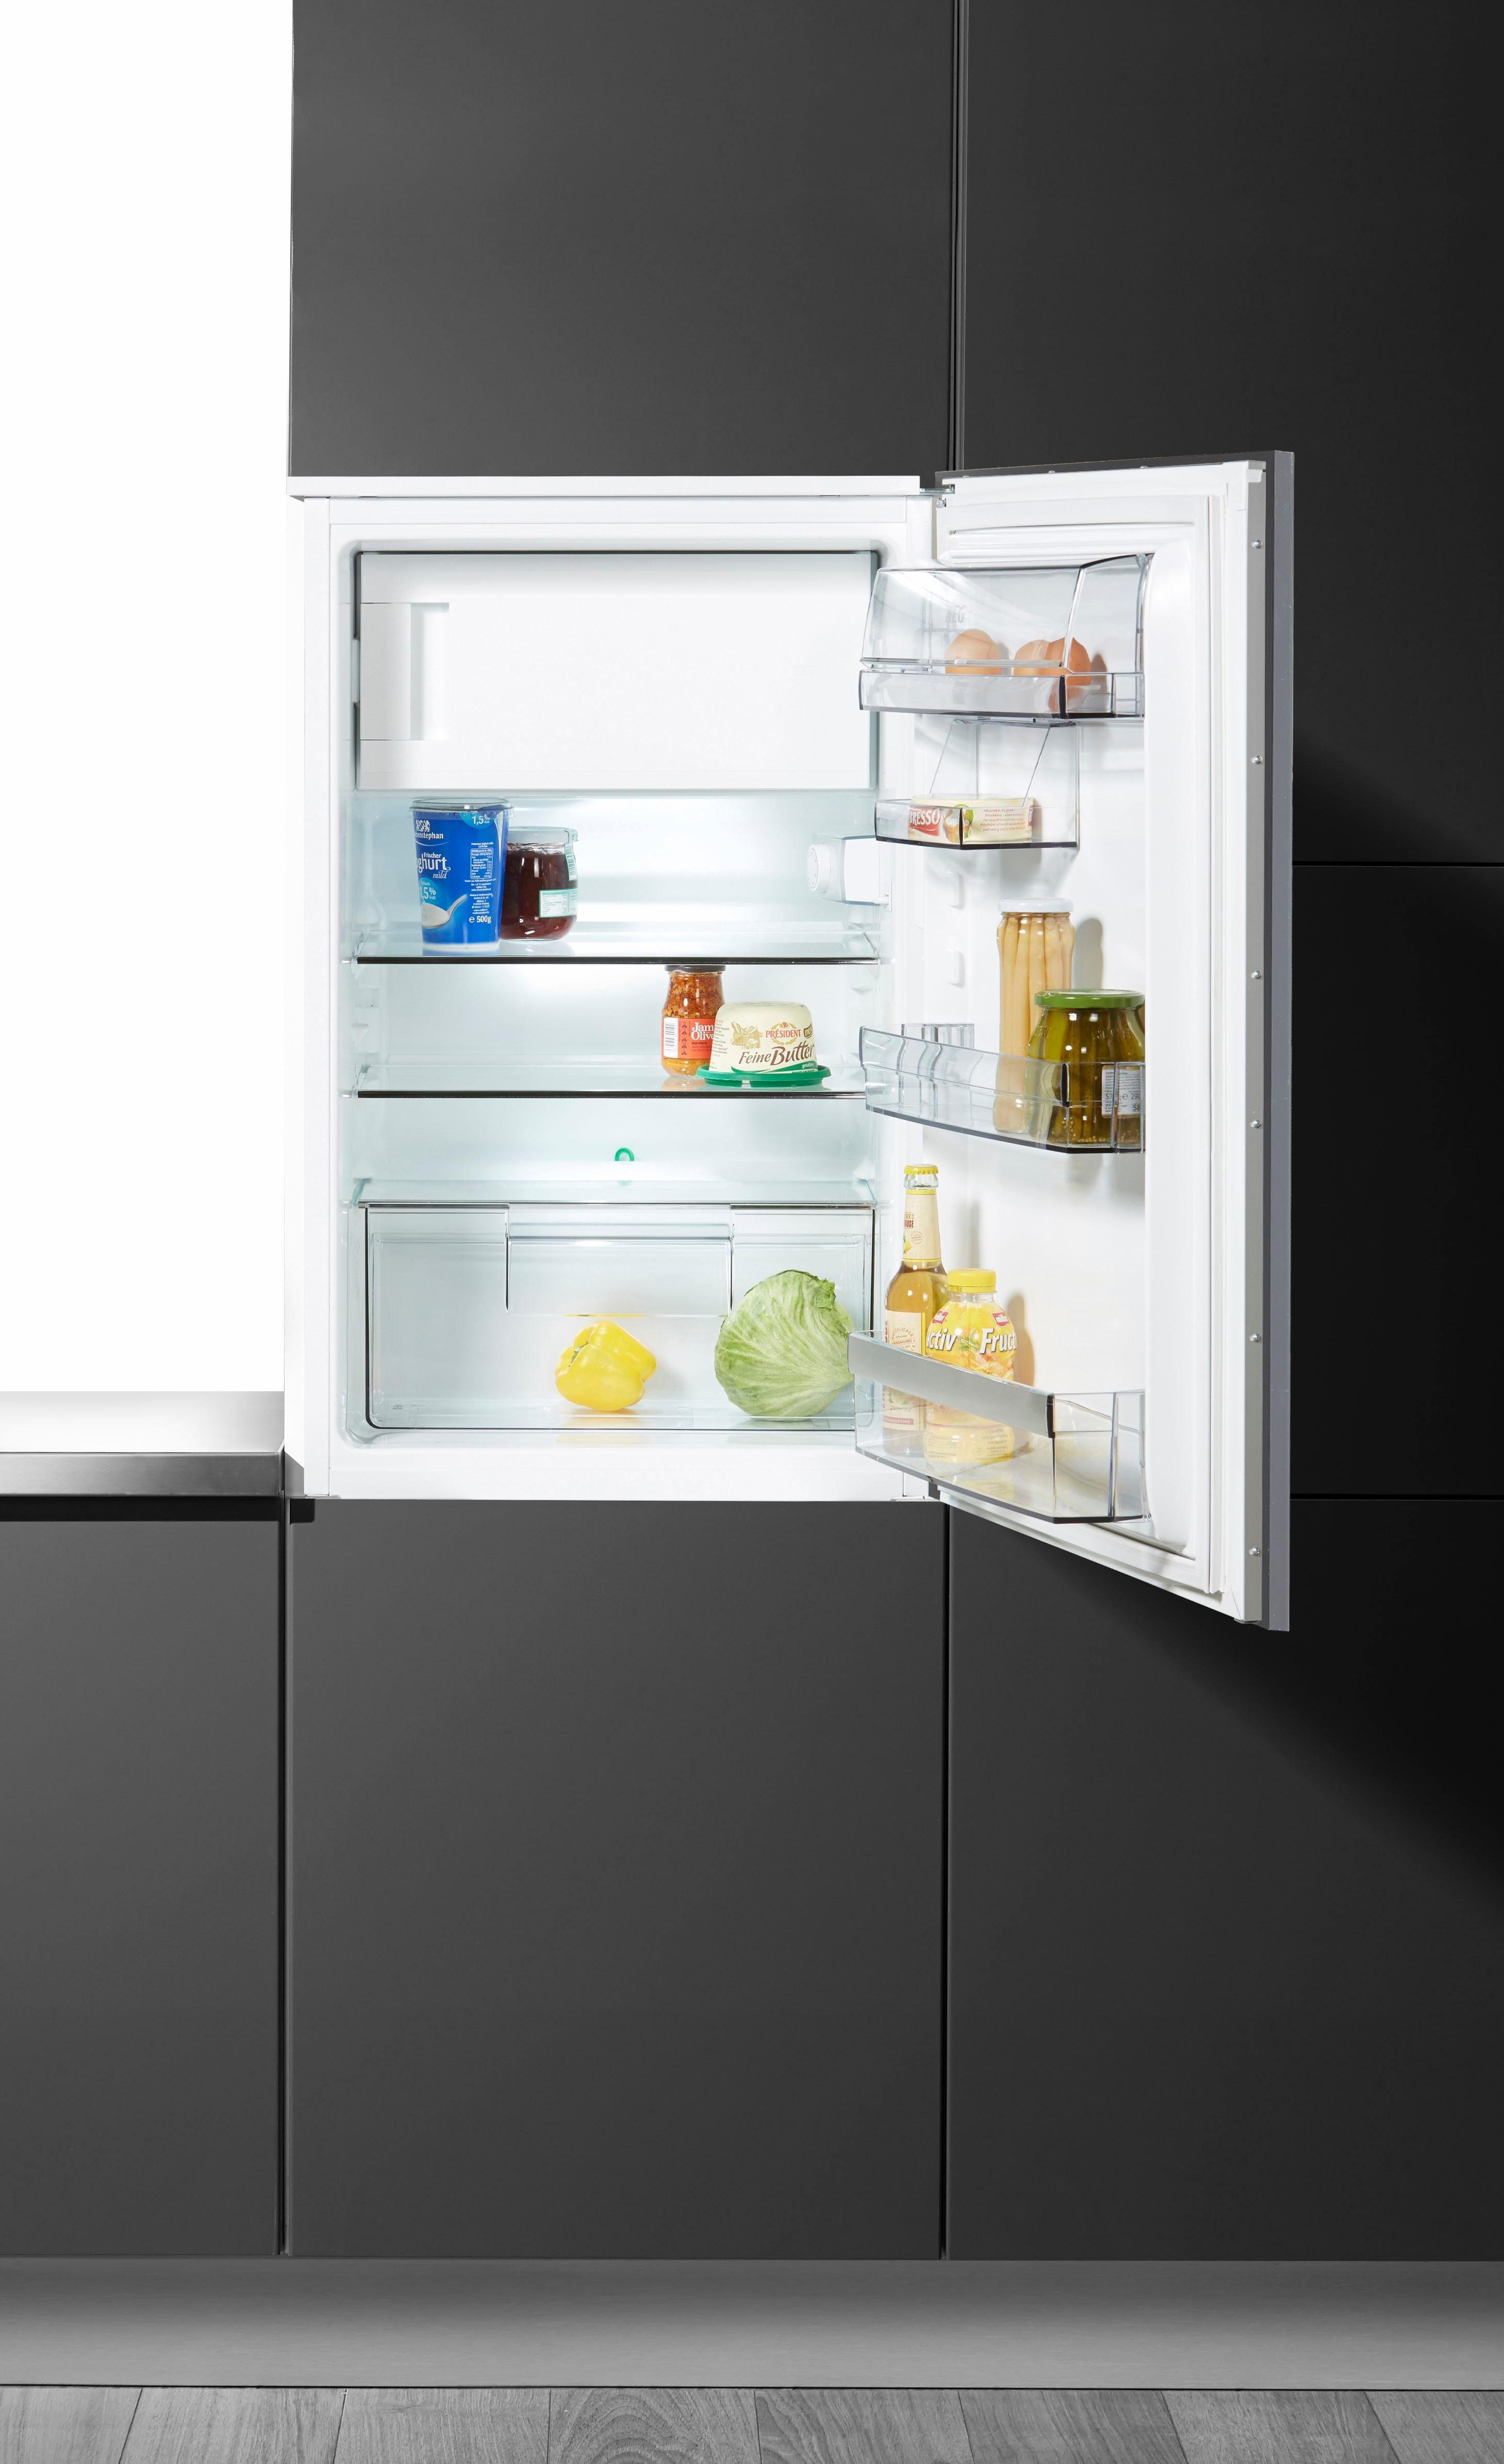 AEG Einbaukühlschrank SANTO SFB58831AE, 87,3 cm hoch, 54,0 cm breit, A+++, 88 cm hoch